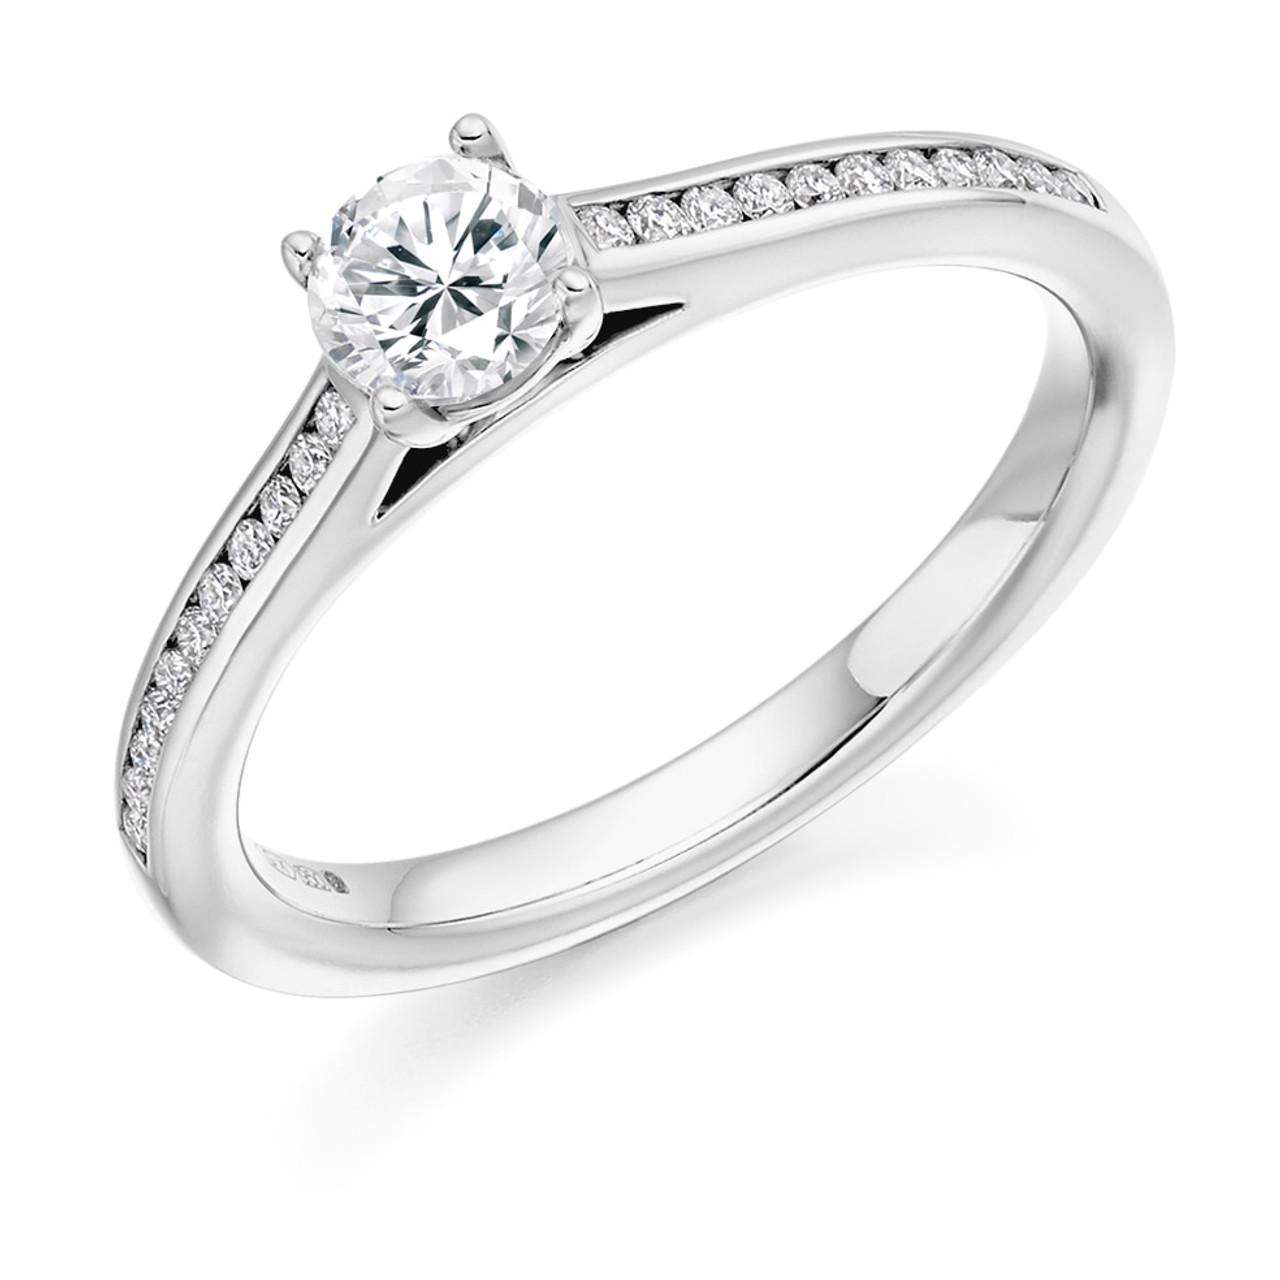 Hawthorn 0.30ct Diamond Engagement Ring